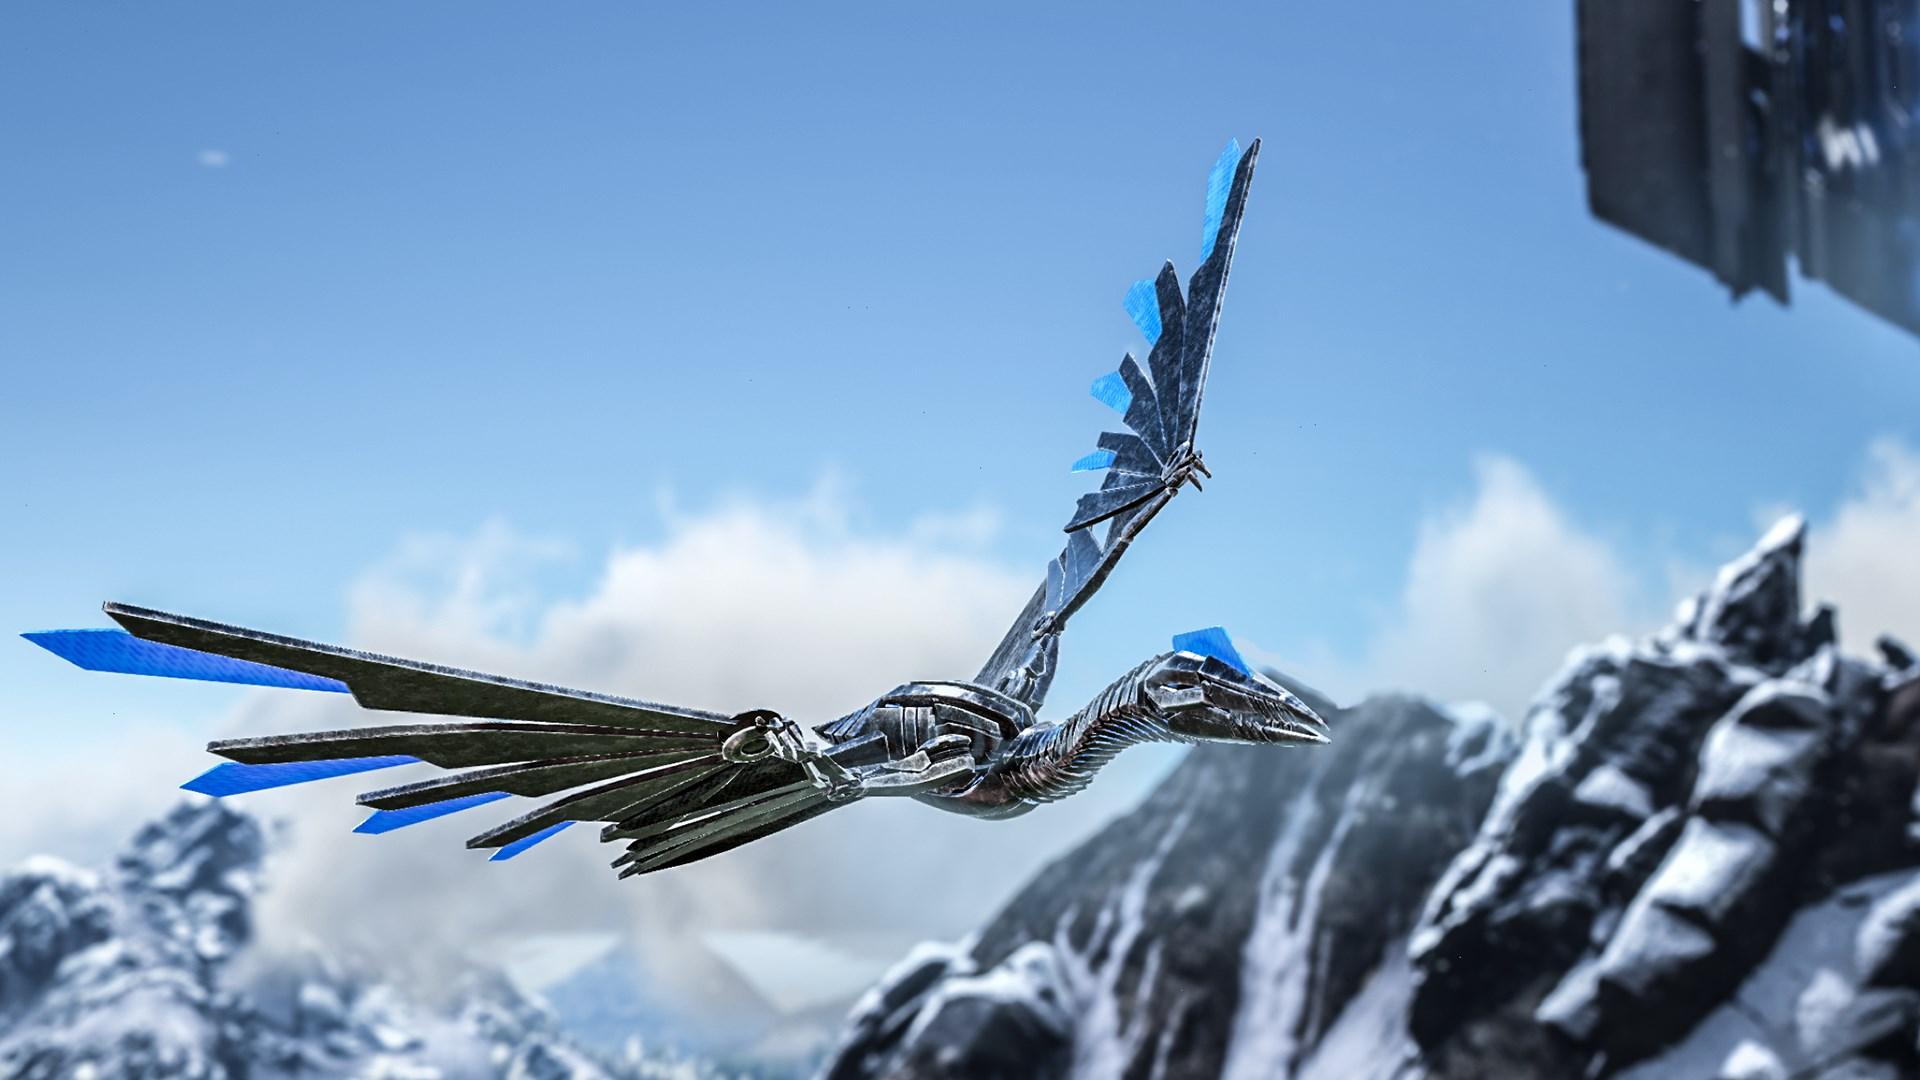 ARK: Survival Evolved Bionic Quetzal Skin